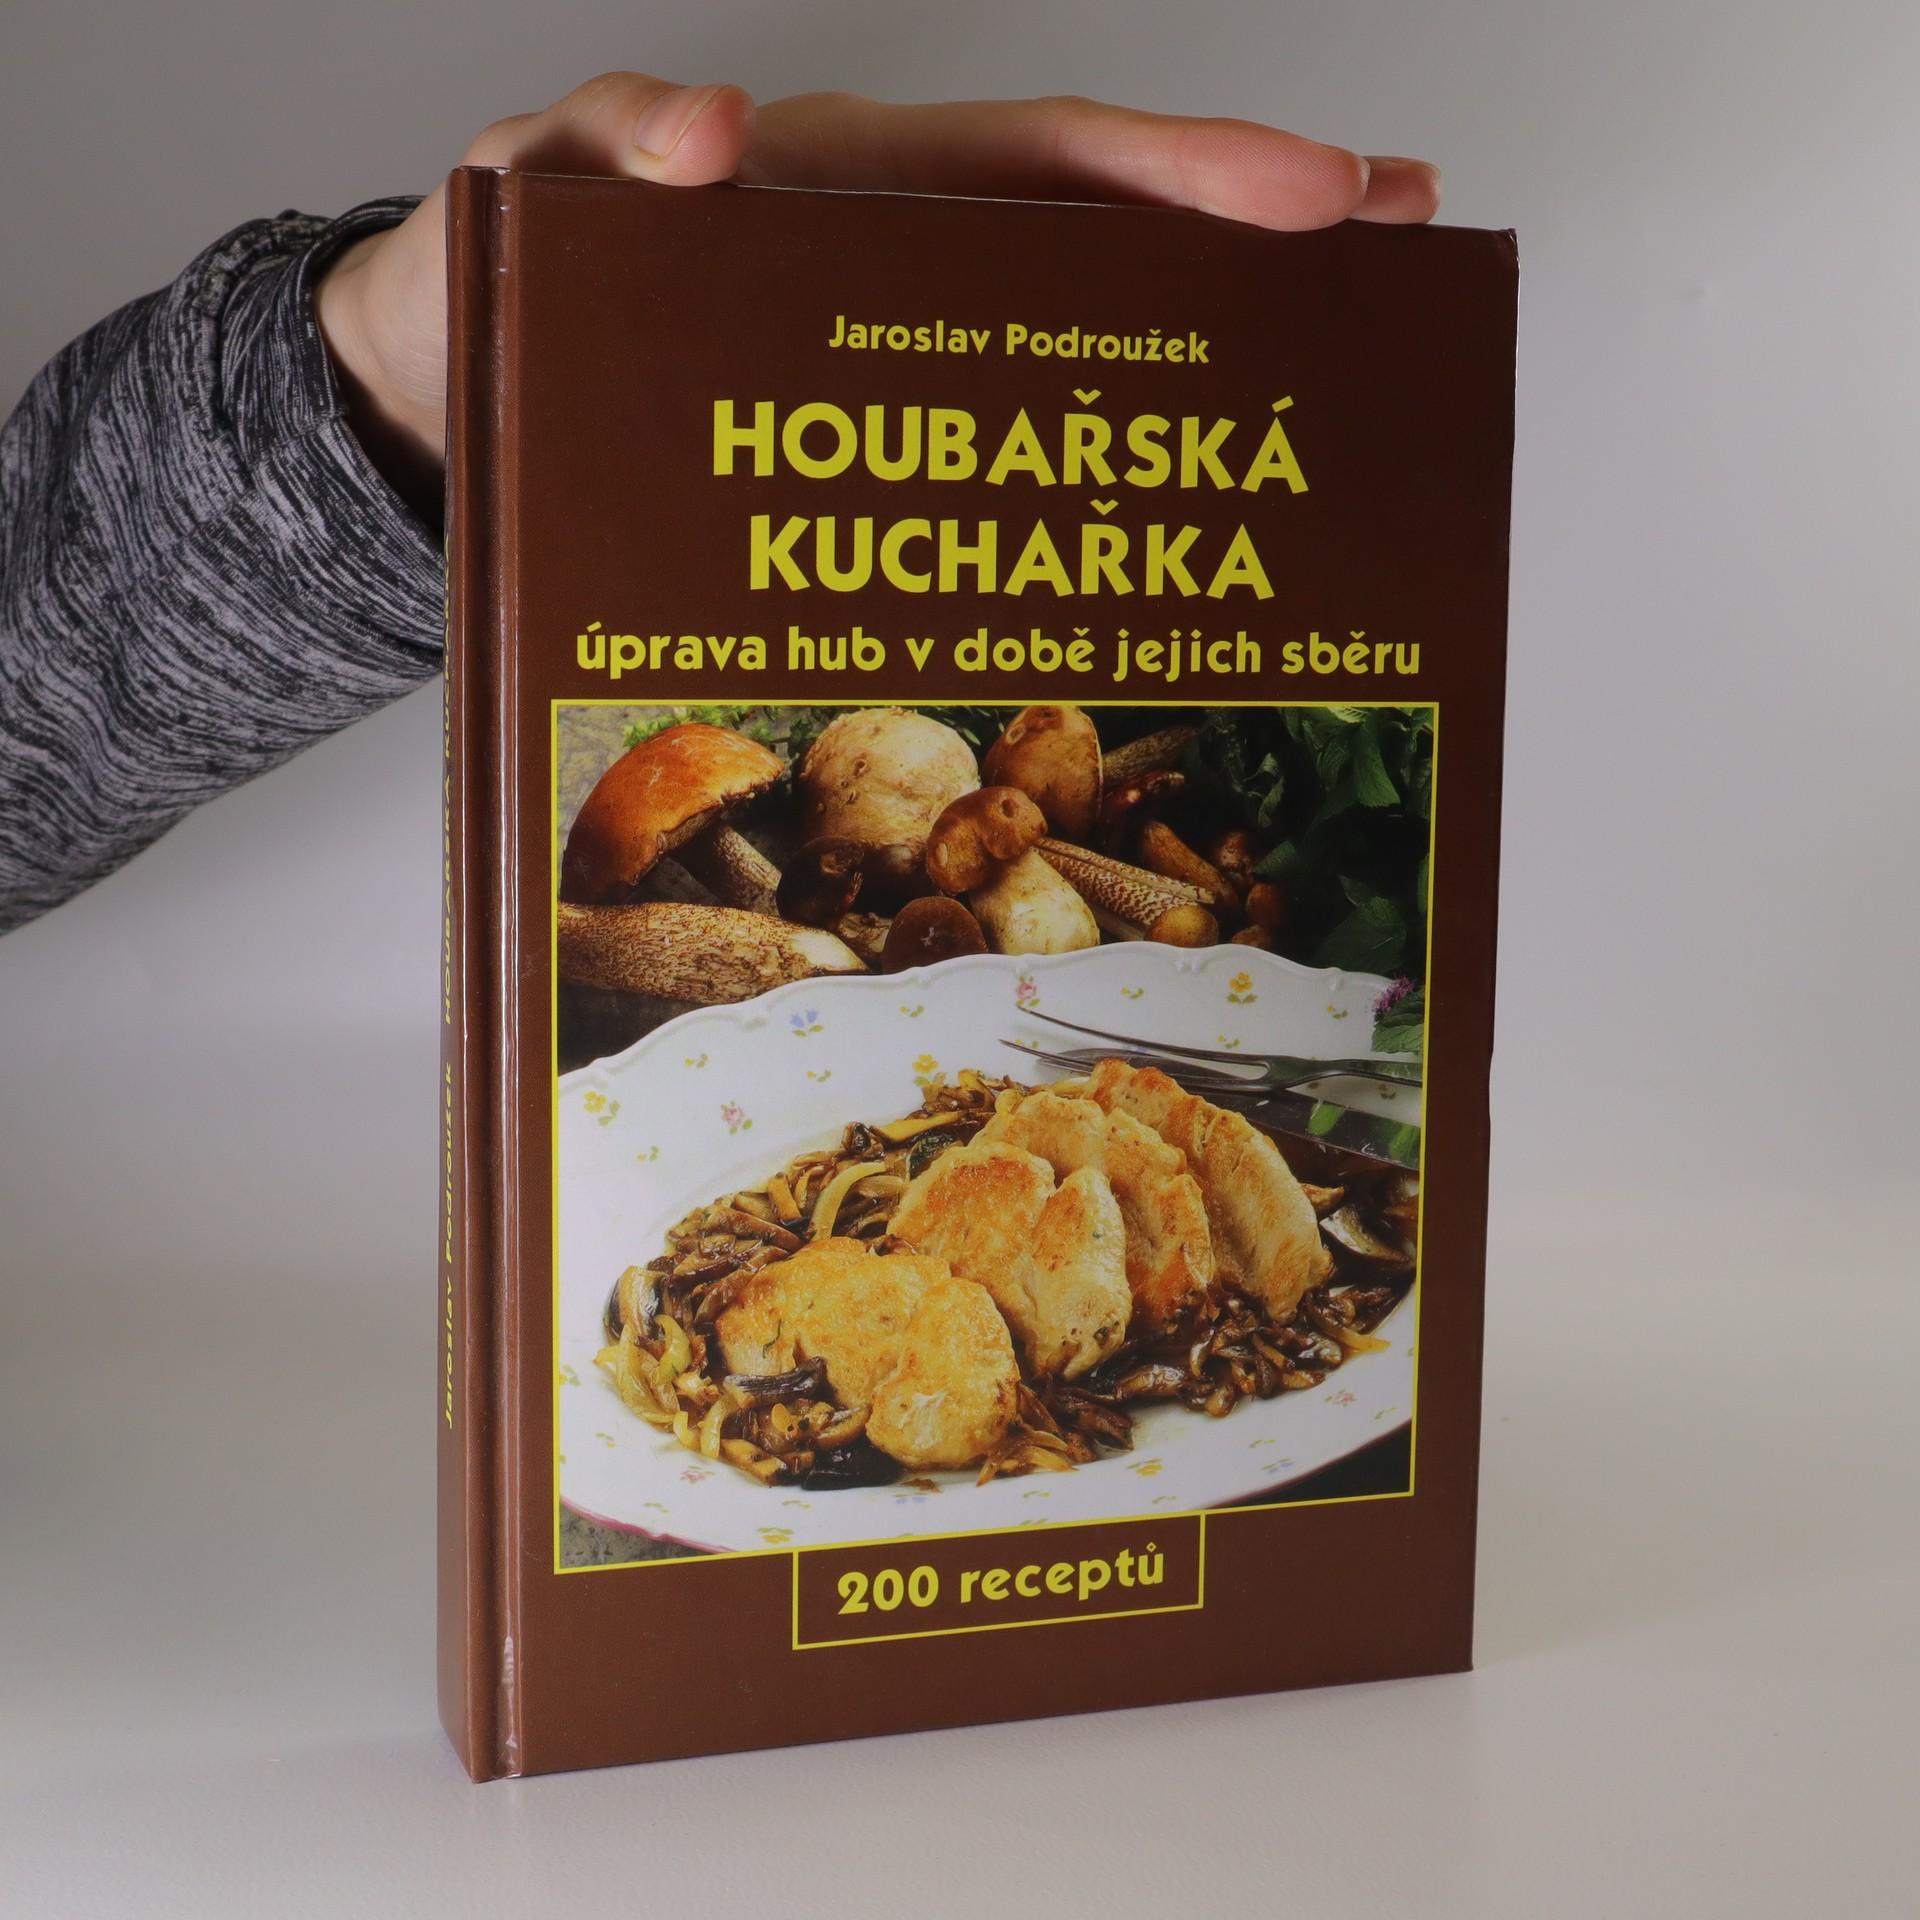 antikvární kniha Houbařská kuchařka, 2003